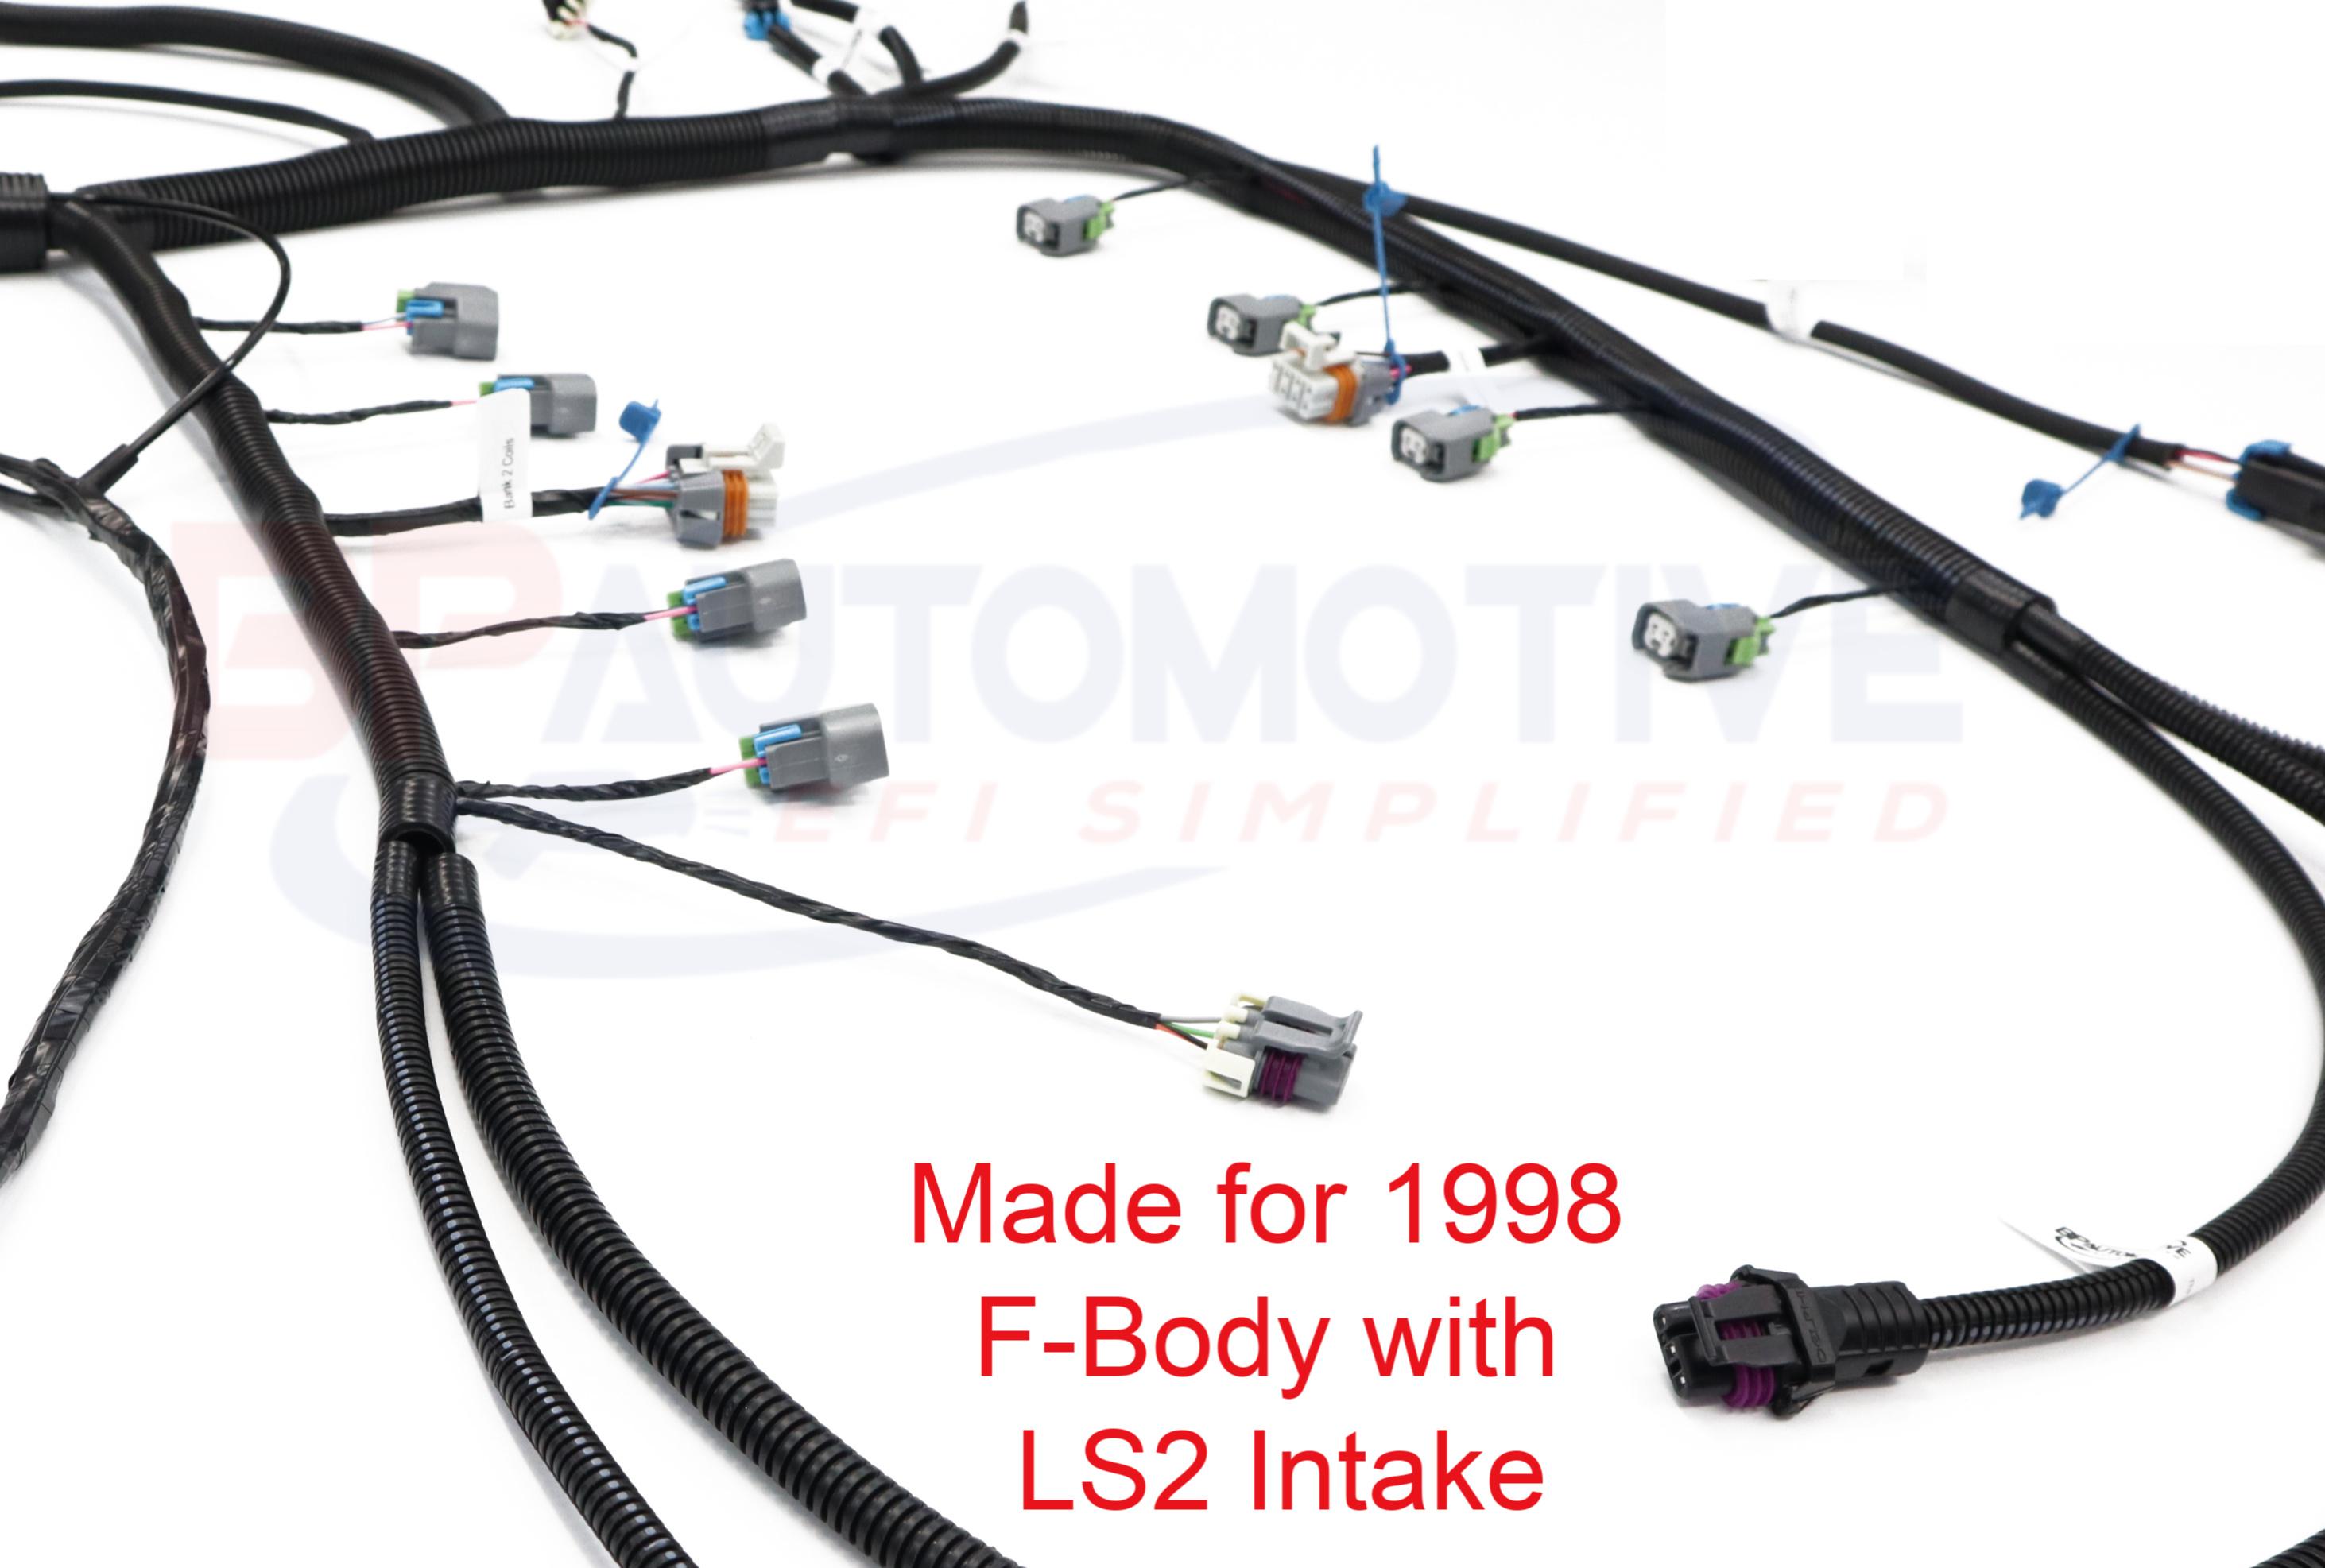 1998 camaro wiring harness - wiring diagrams site thick-star-a -  thick-star-a.geasparquet.it  geas parquet